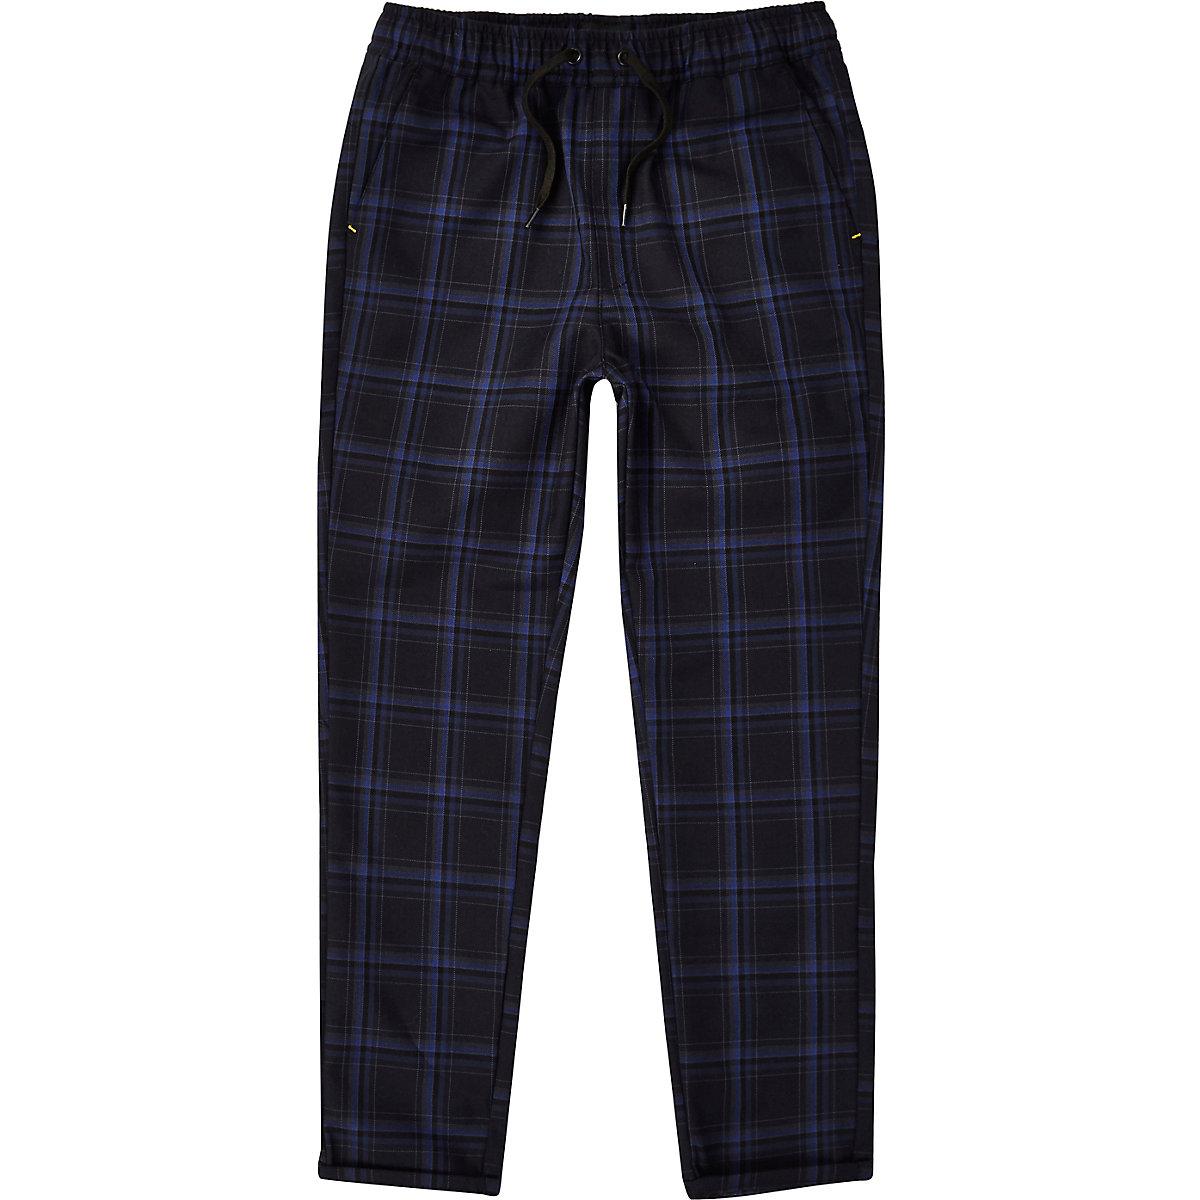 Boys RI Studio navy check pants